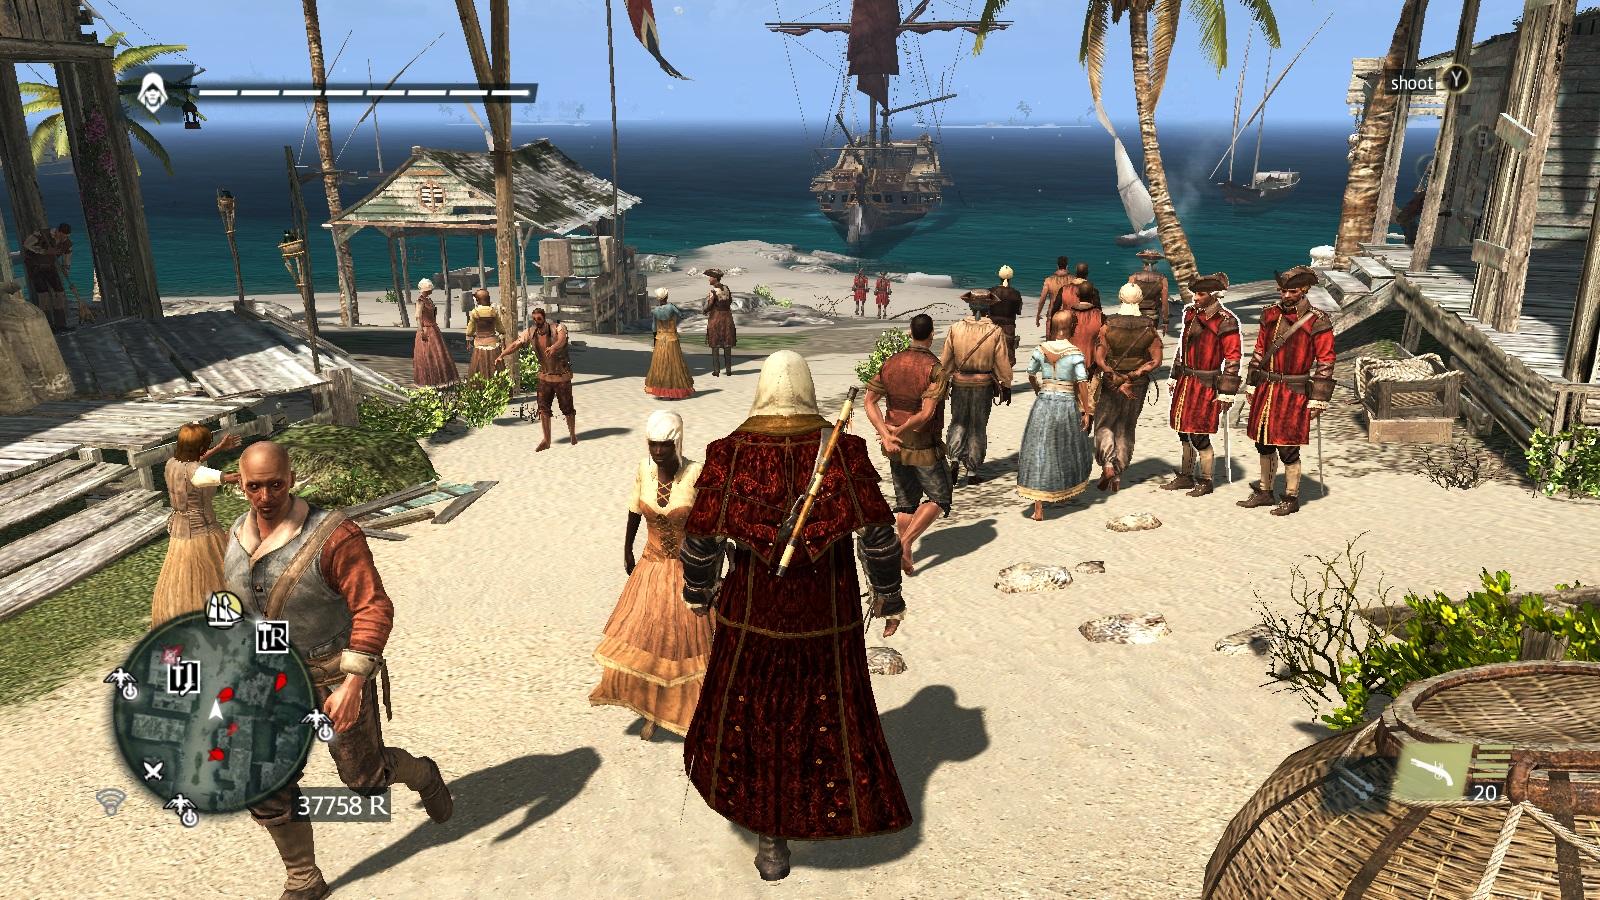 Assassins Creed IV: Black flag, aneb bukanýrem snadno a rychle 7541